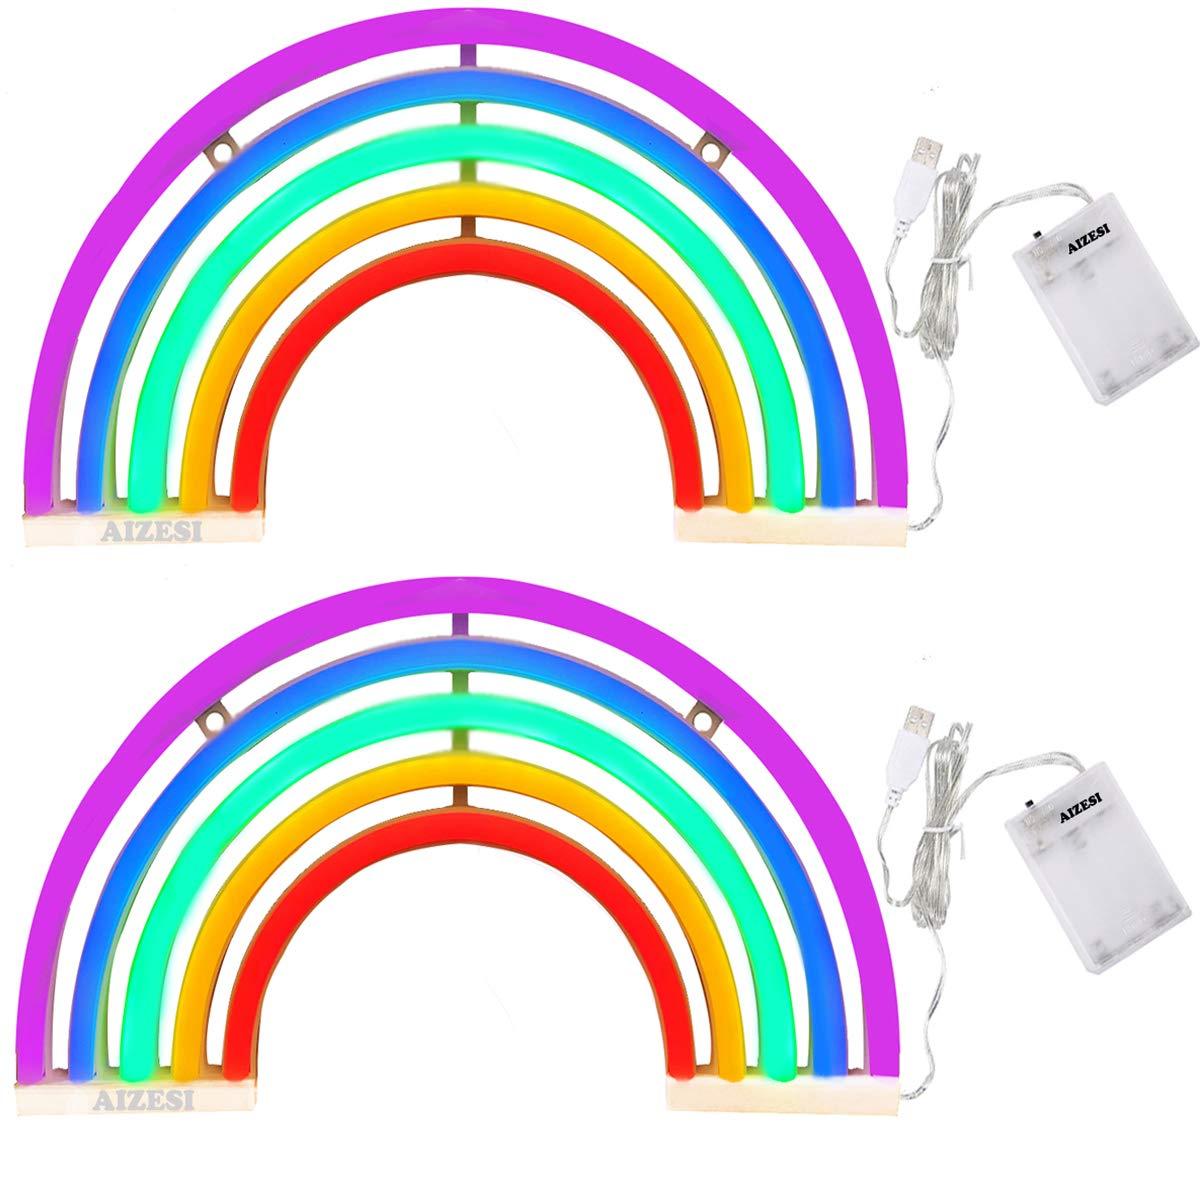 AIZESI 2PCS Rainbow Lights,Rainbow Neon Lamps,Rainbow Room Decor,Night Light Battery Operated (Rainbow)